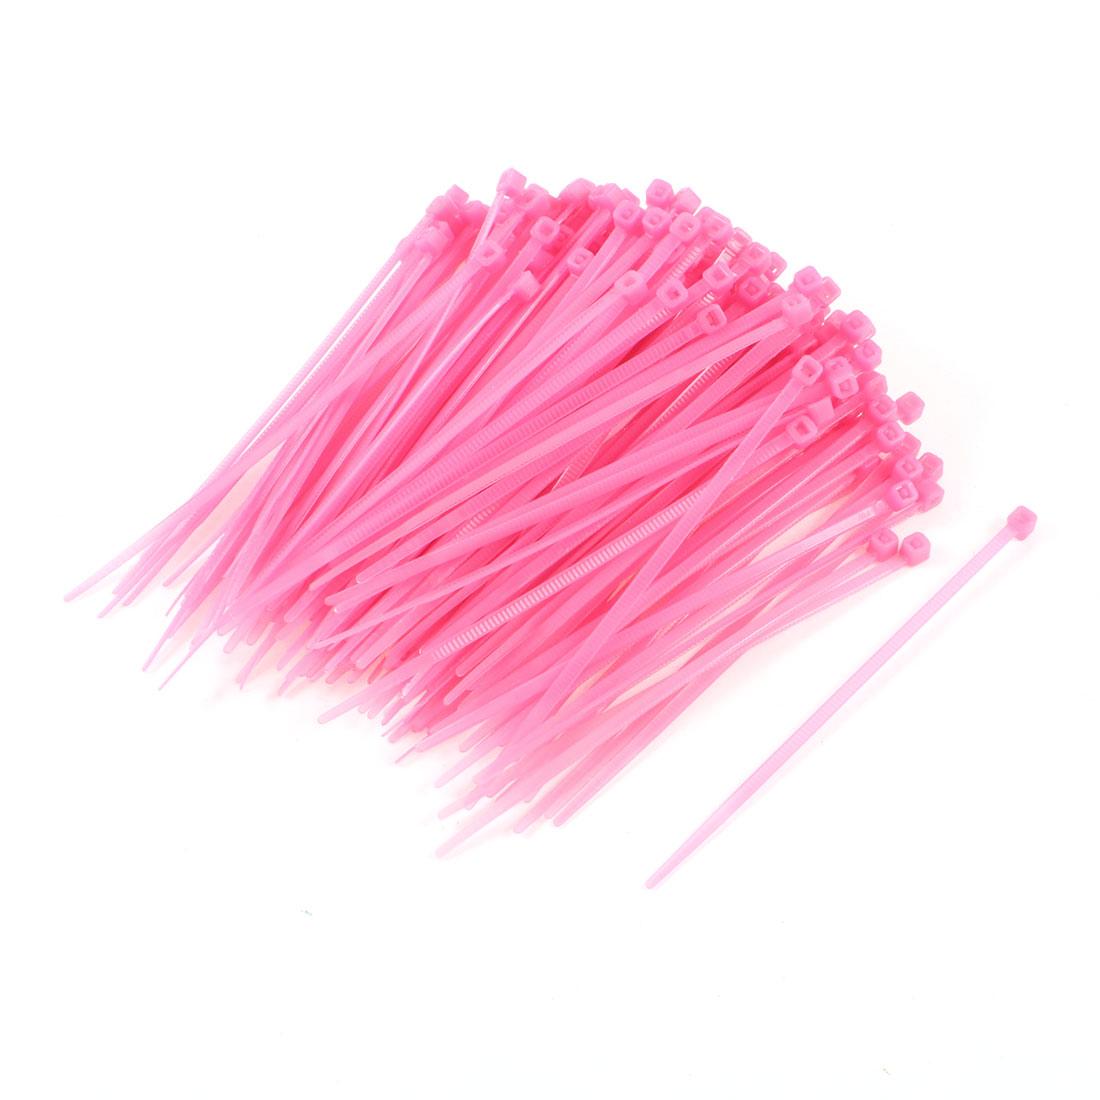 200 Pcs Adjustable Self Locking Pink Cable Zip Ties Pink 10cm Long